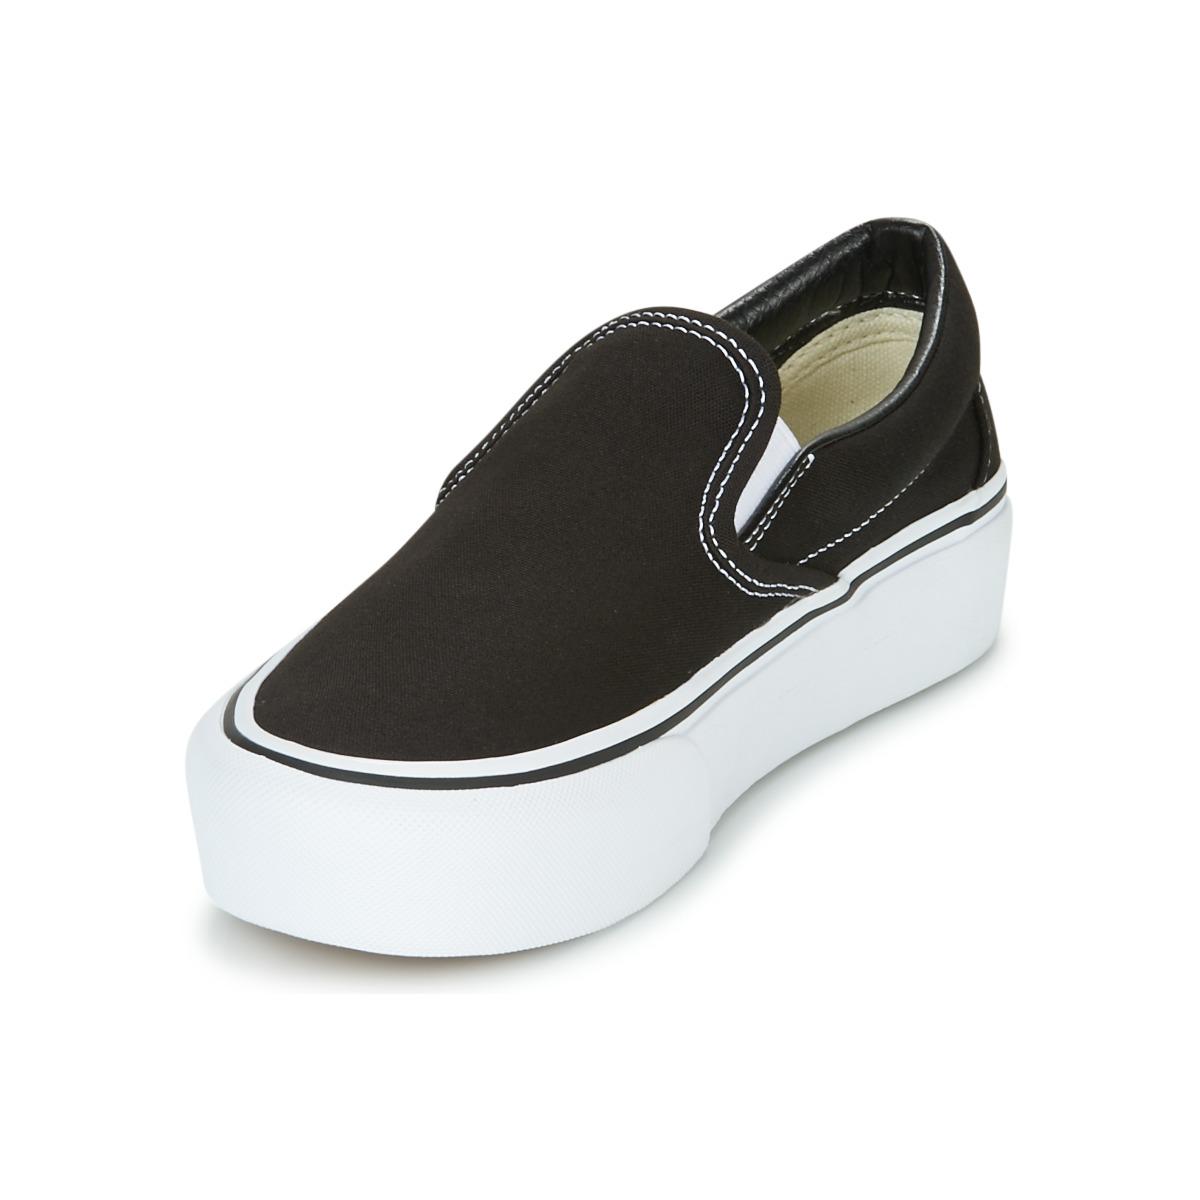 scarpe donna vans slip on